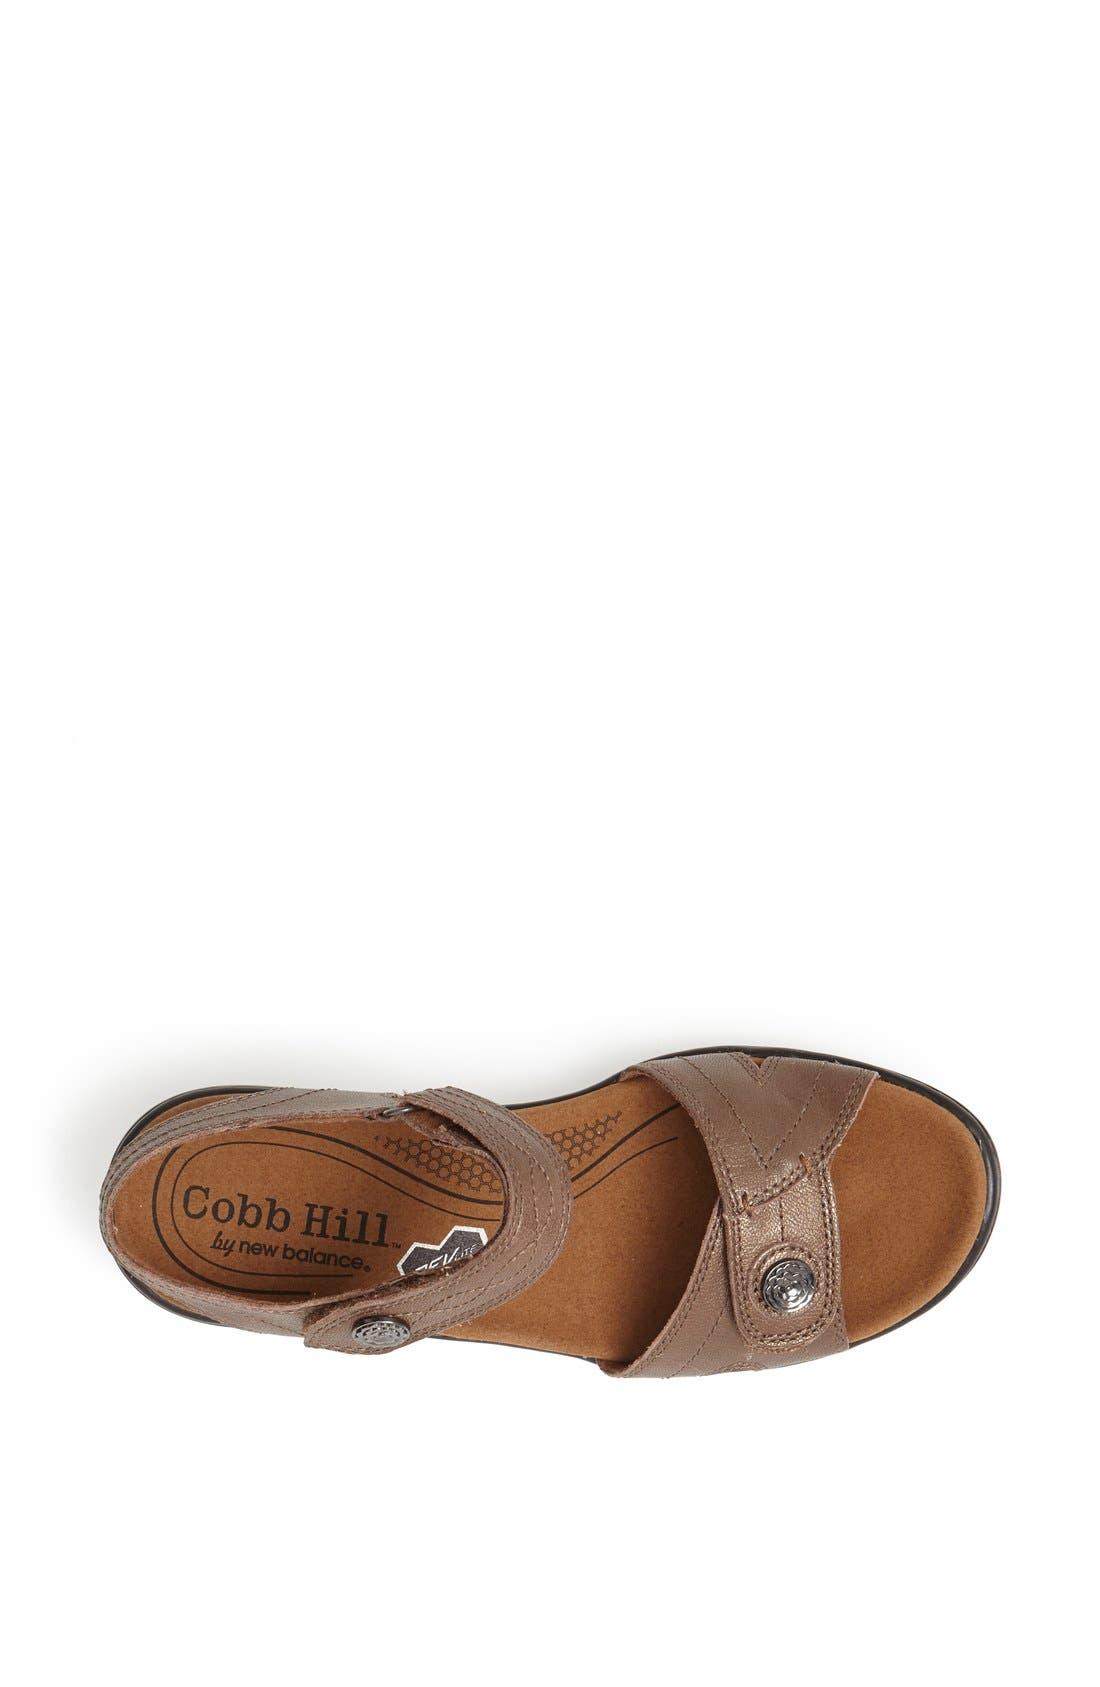 Alternate Image 3  - Cobb Hill 'Minx' Sandal